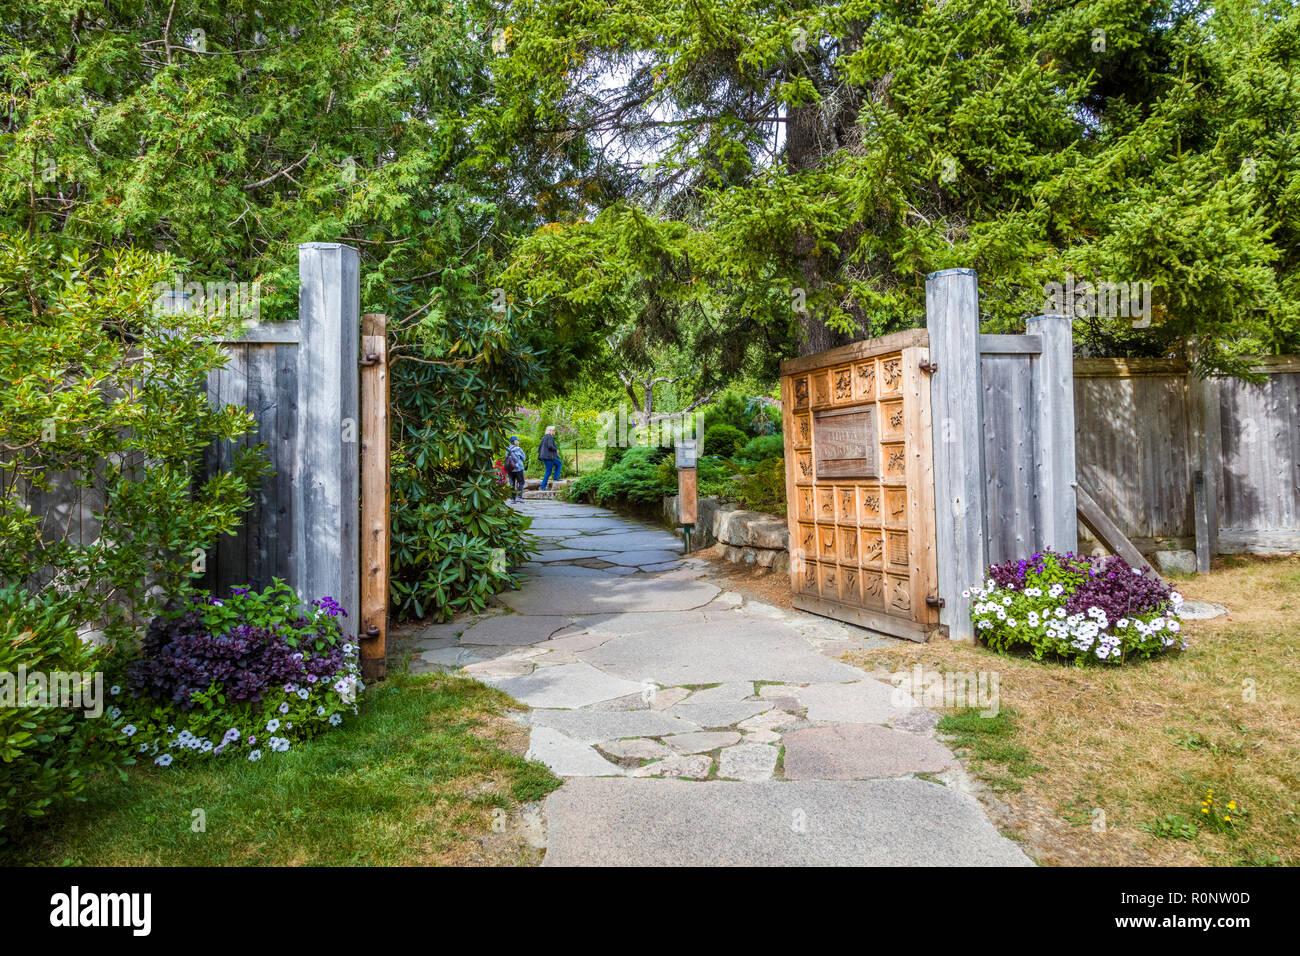 Thuya Garden in Northeast Harbor on Mount Desert Island in Maine, United States Stock Photo